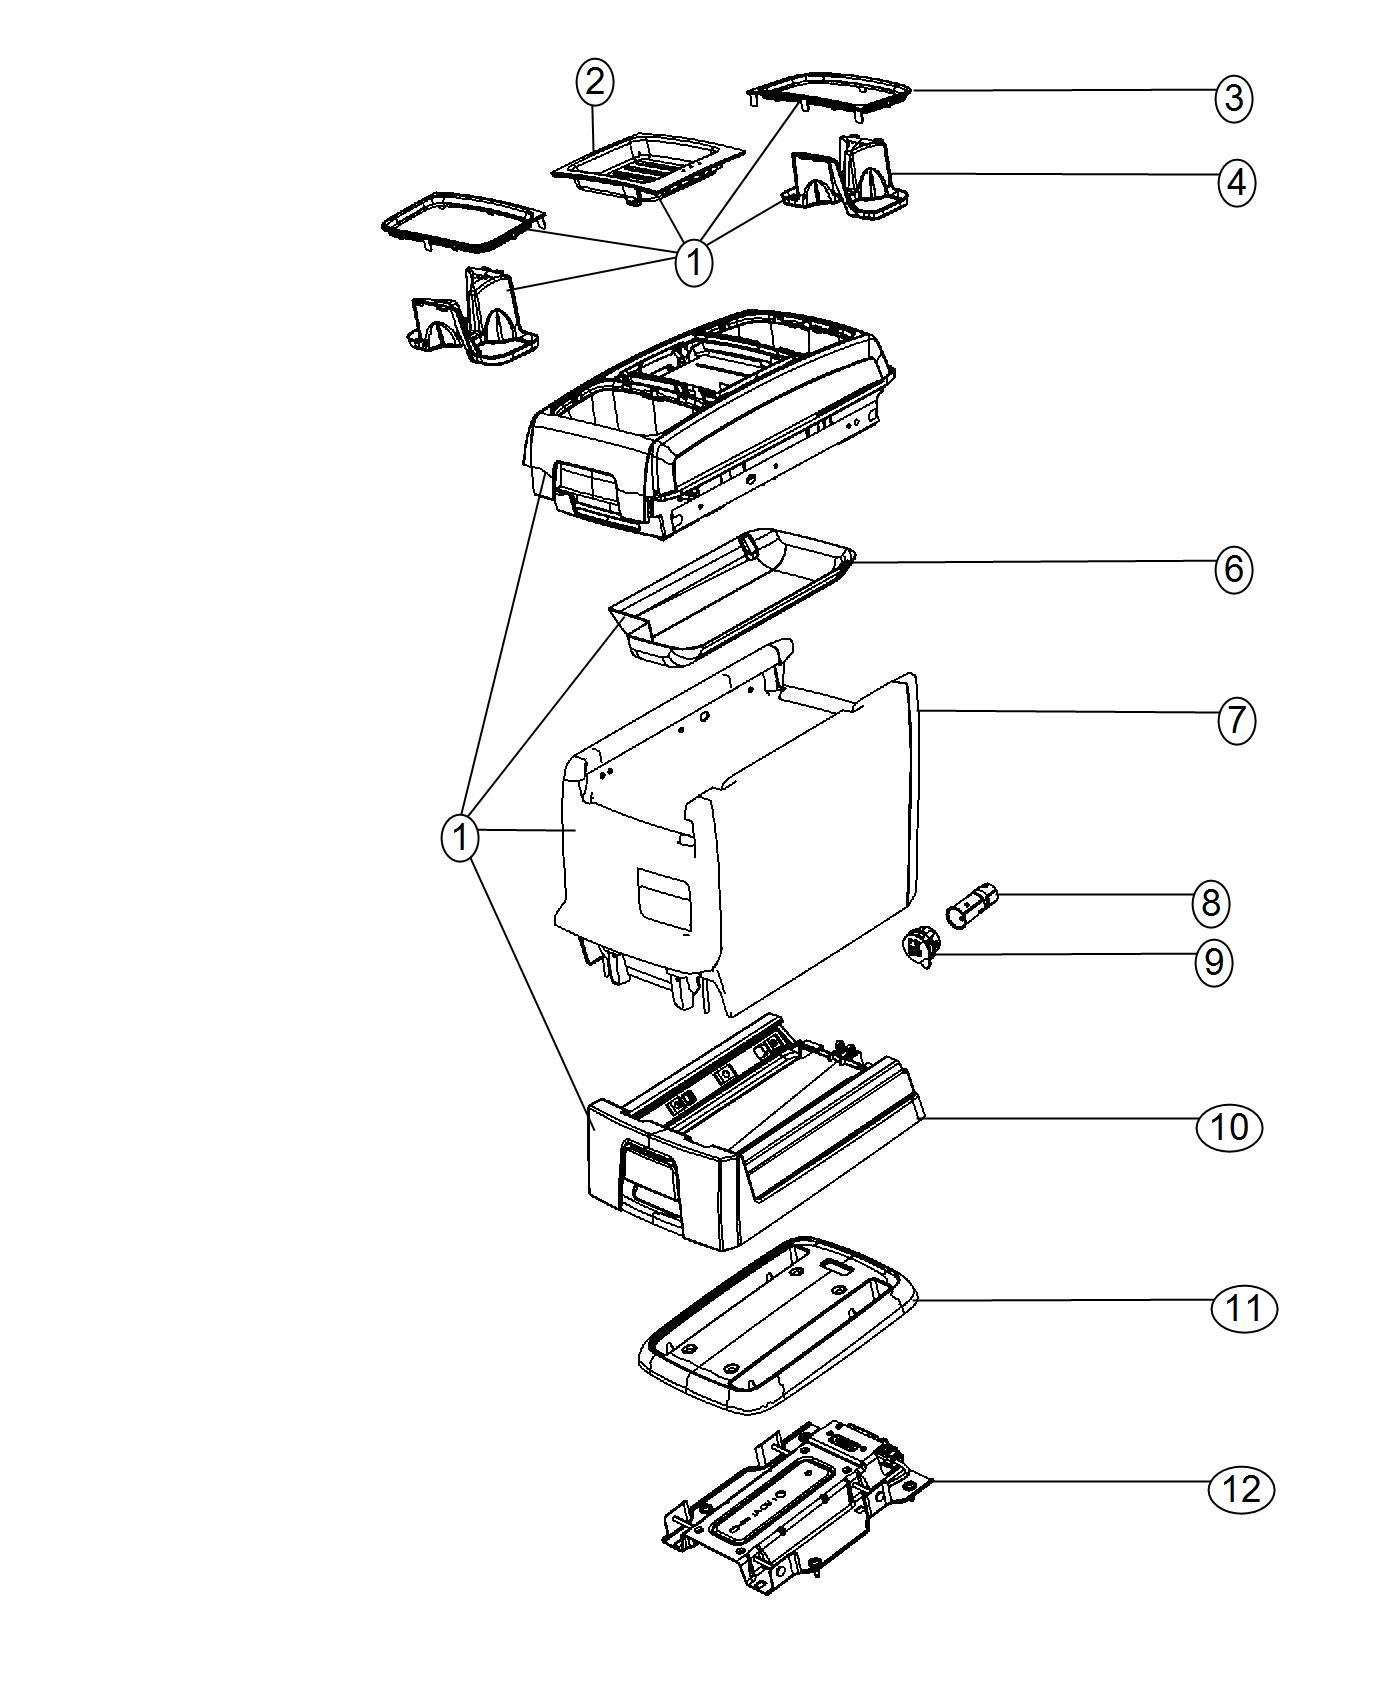 caravan internal wiring diagram 2002 chevy silverado radio dodge grand 2014 model interior imageresizertool com